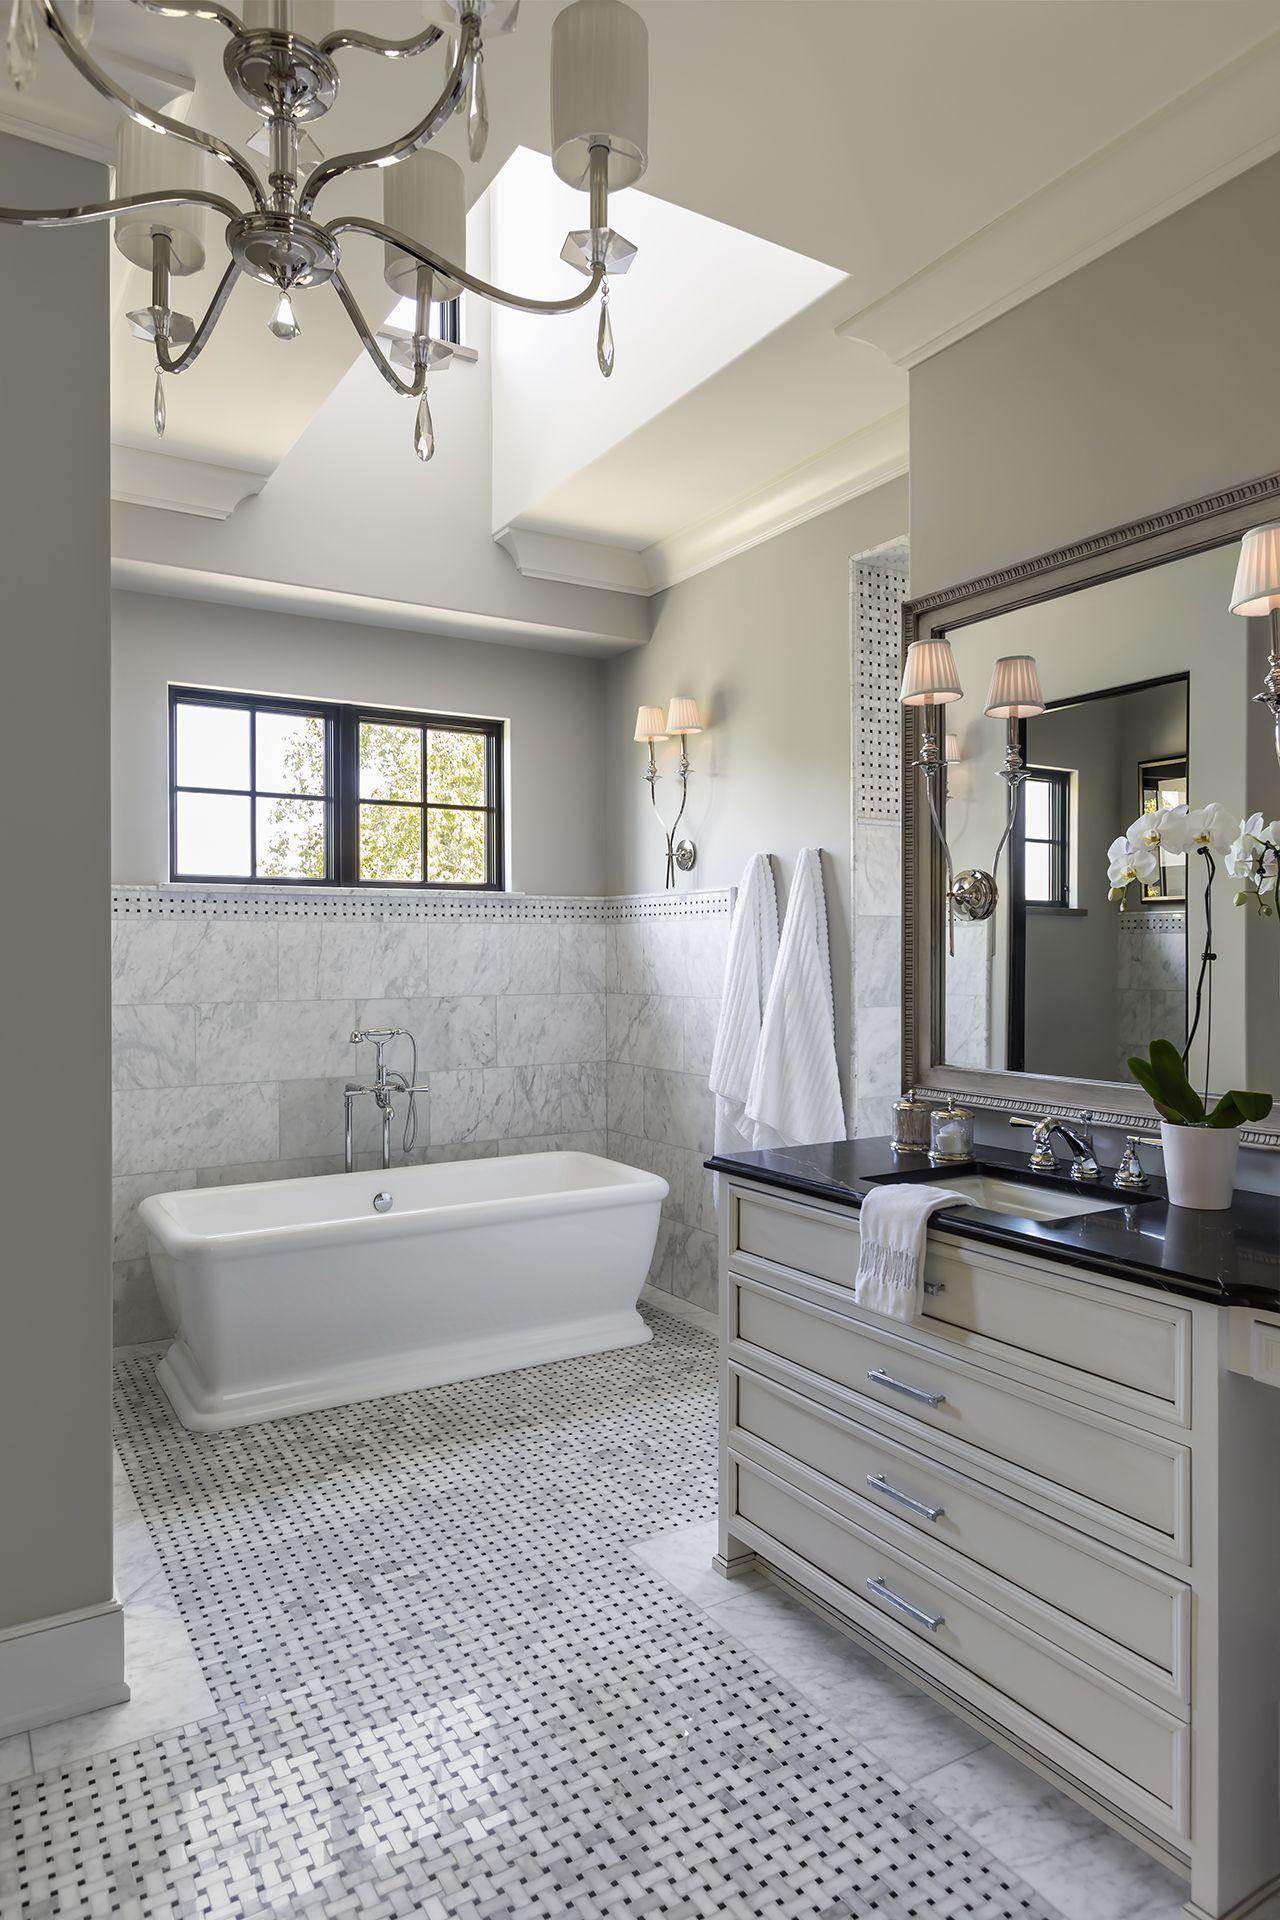 House Beautiful Bathrooms: Master Bathroom In 2019